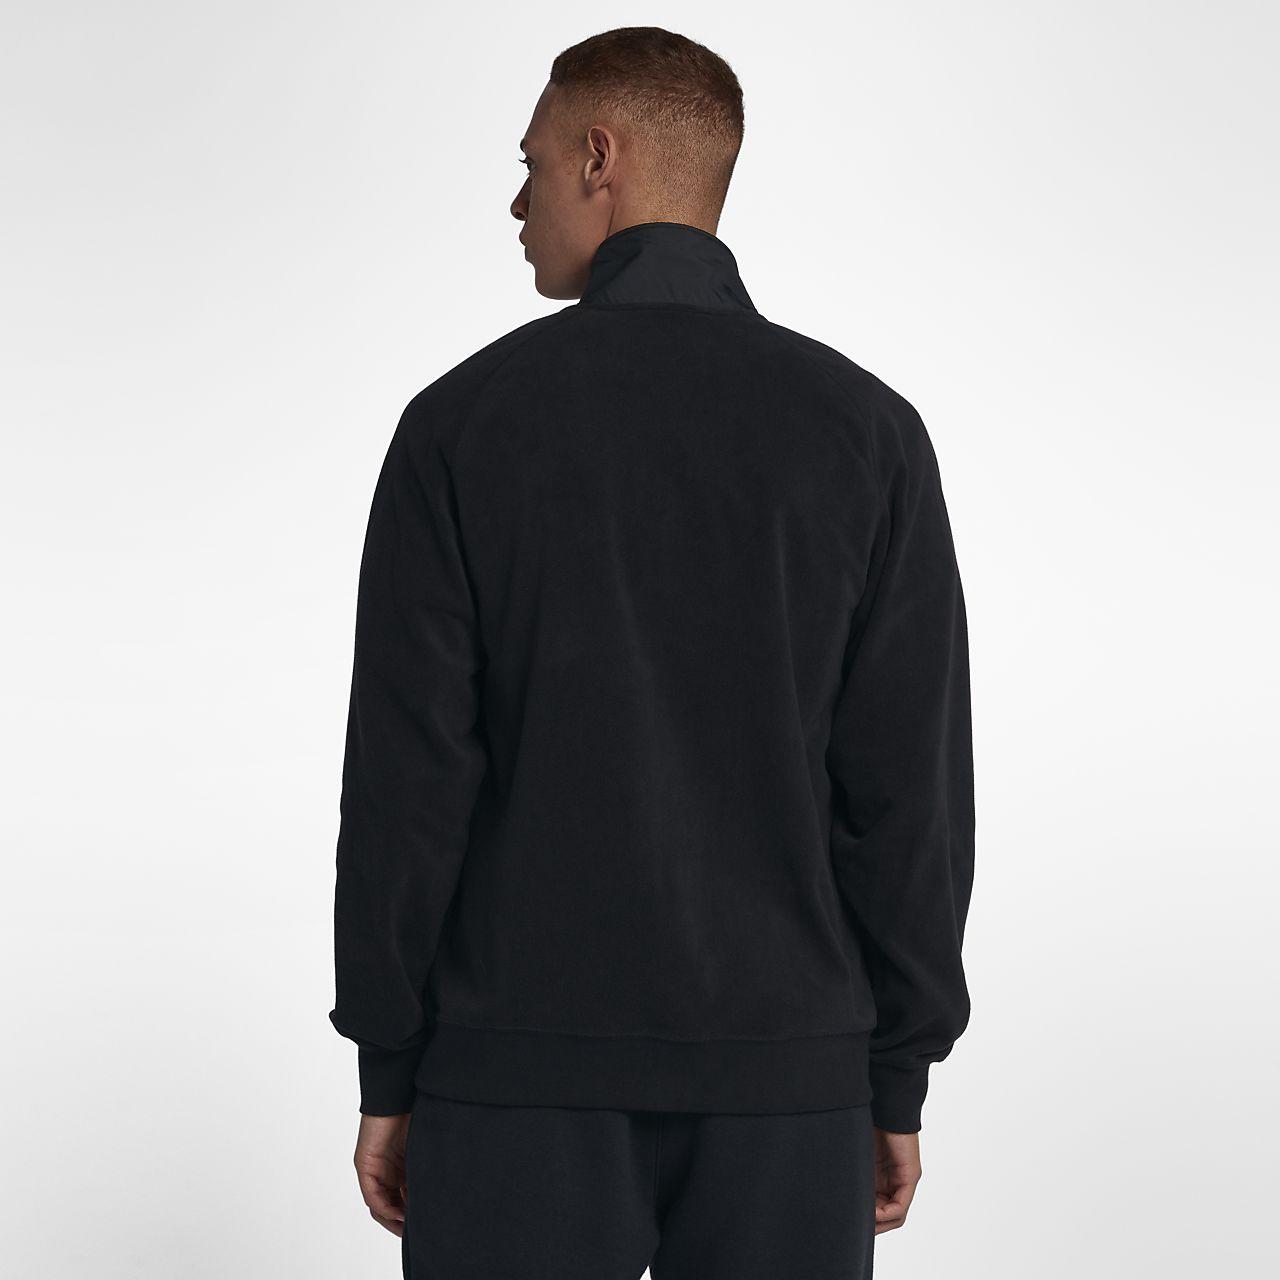 cc81eb8927e2a Nike Sportswear Men's Half-Zip Top. Nike.com ZA